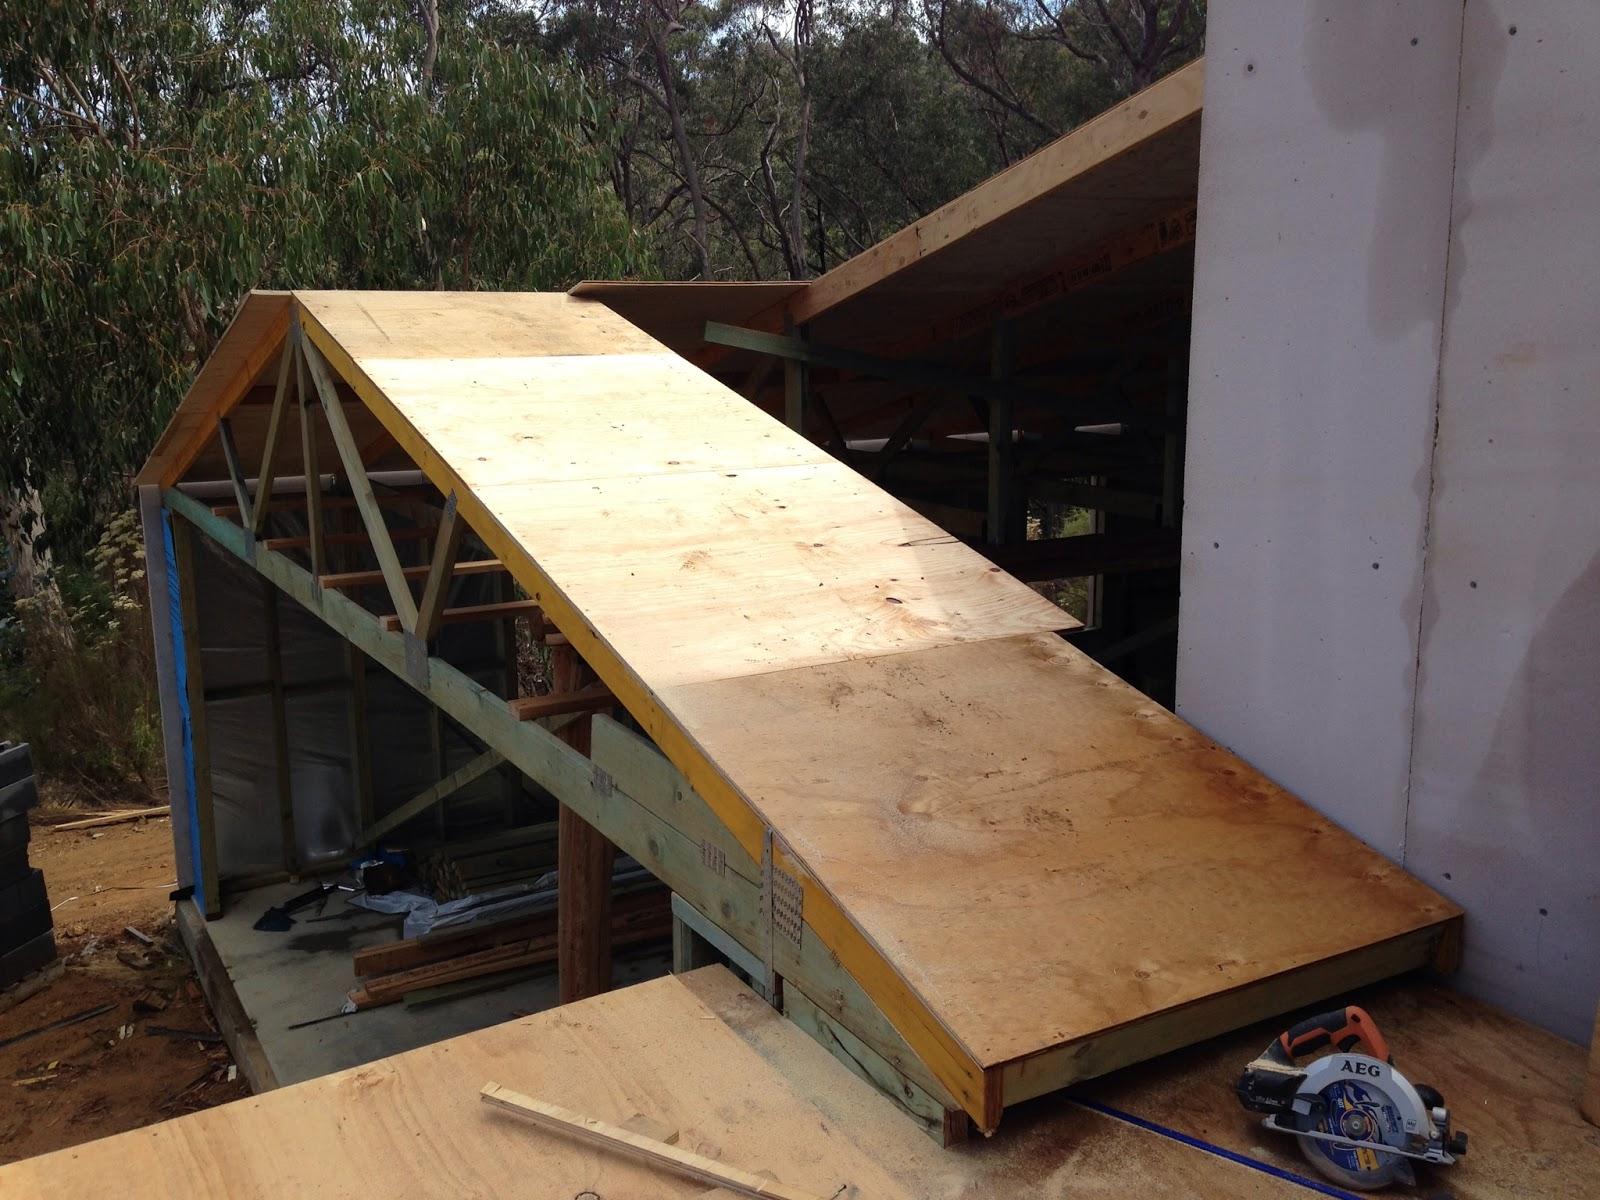 The taj garage finishing roof